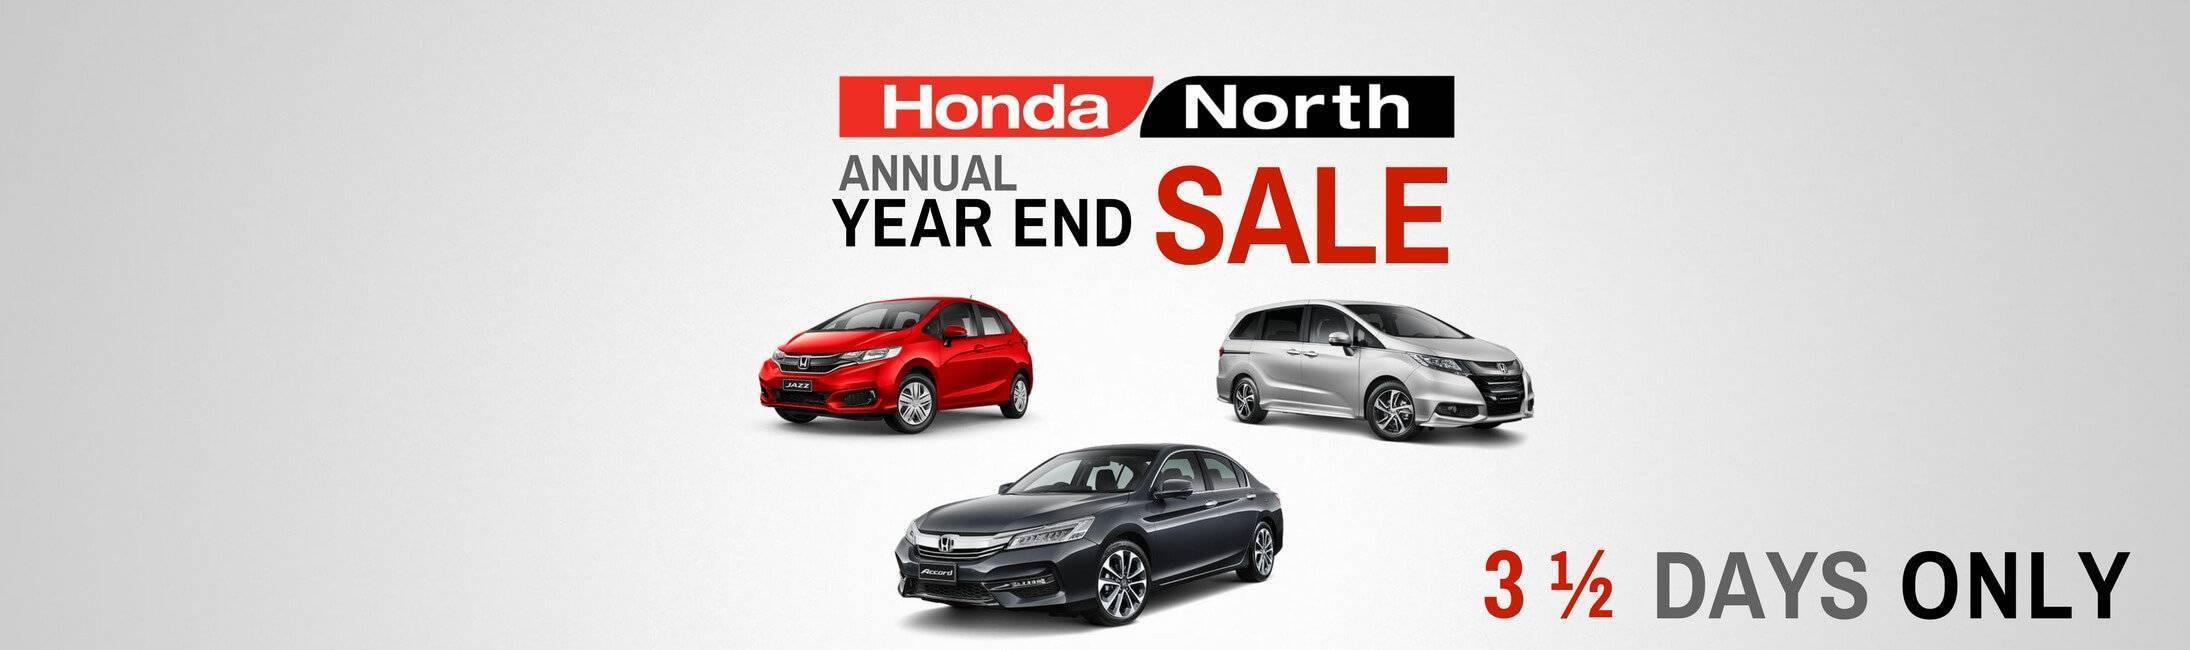 HondaNorth-Year End Sale